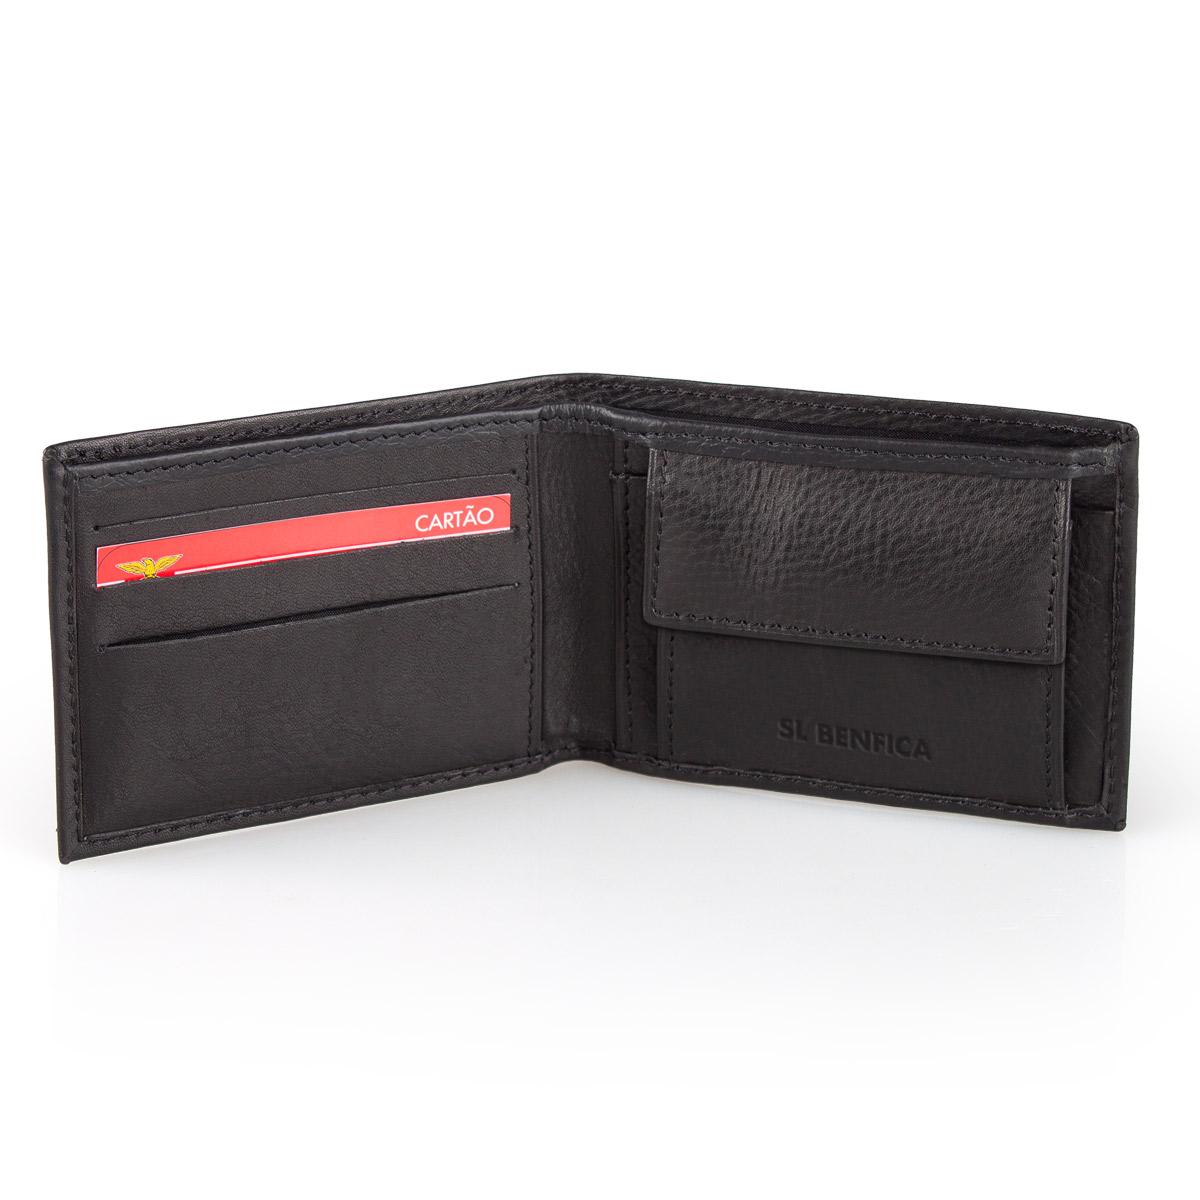 Leather  Wallet S.L. BENFICA Black 10cm – image 3